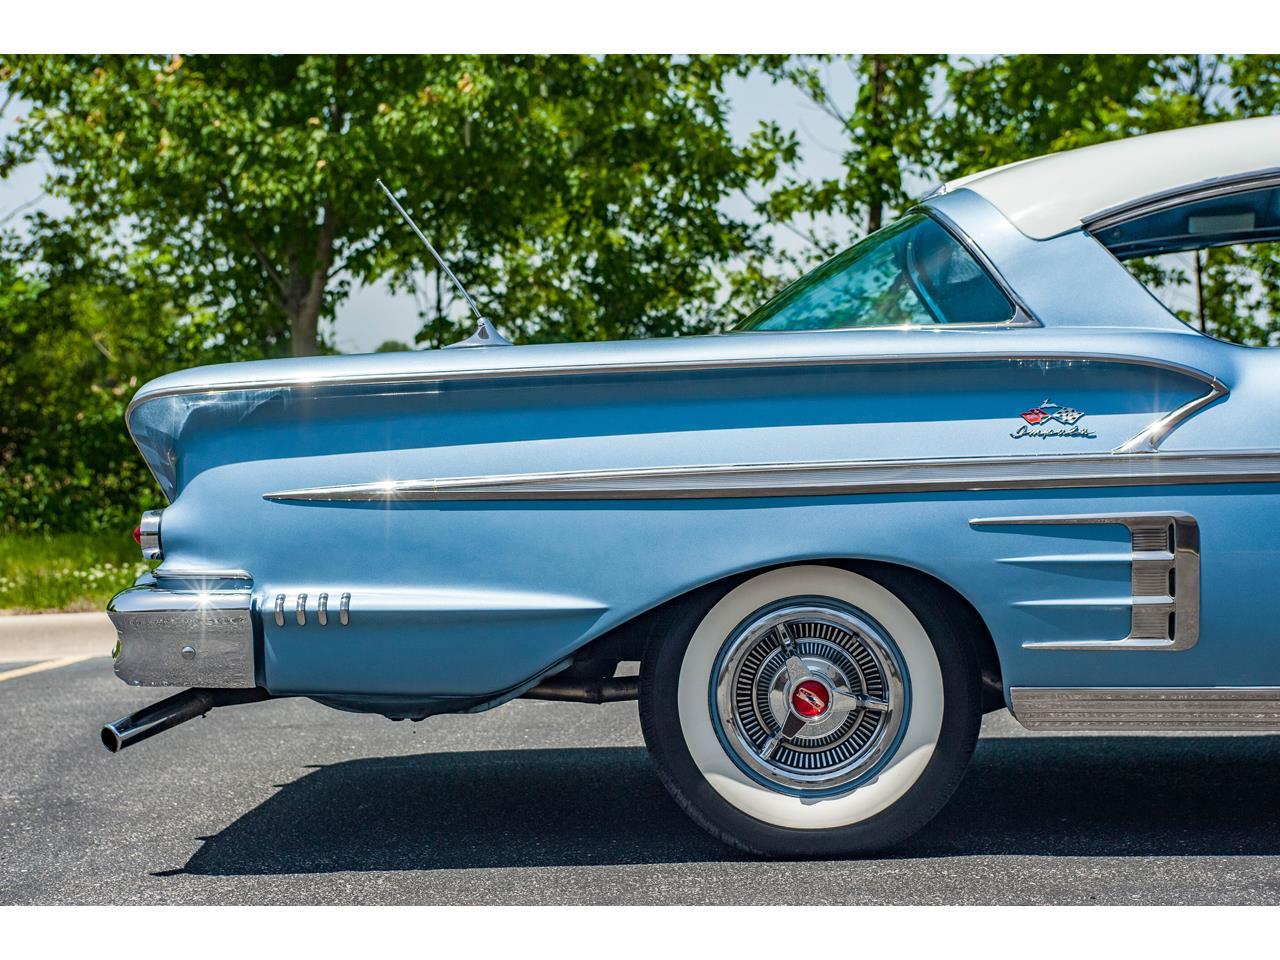 Large Picture of Classic 1958 Impala located in Illinois - $62,000.00 - QB9Q